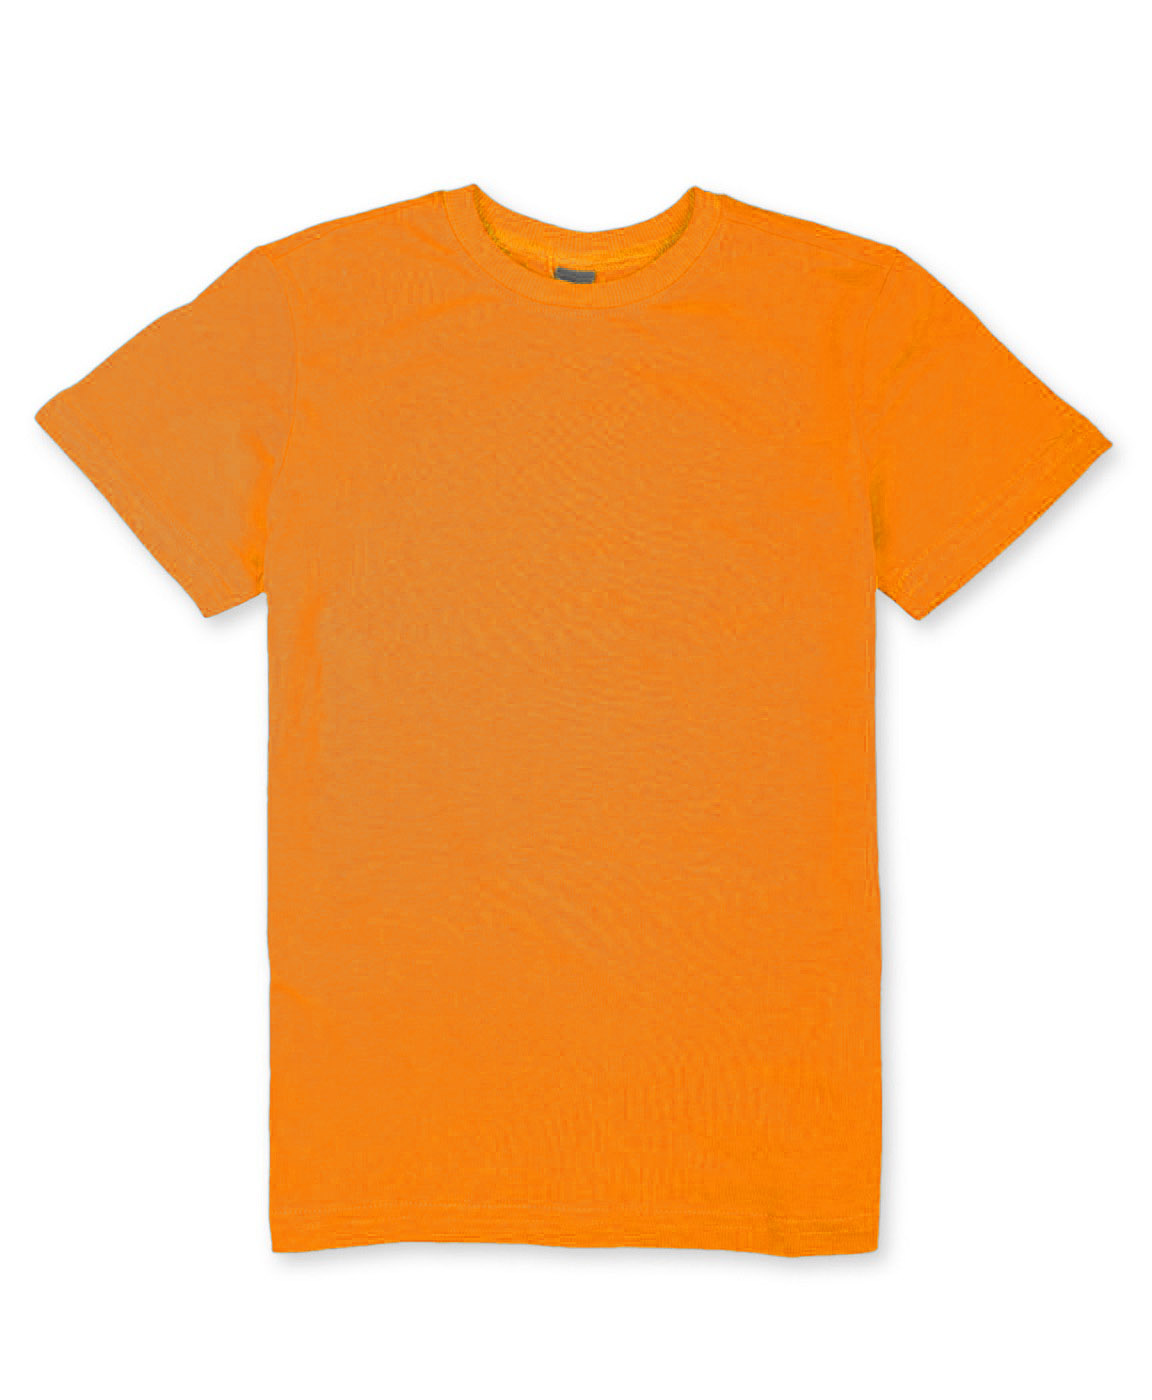 Футболка однотонная оранжеваяКоллекция ВЕСНА-ЛЕТО<br><br><br>Размер: 68